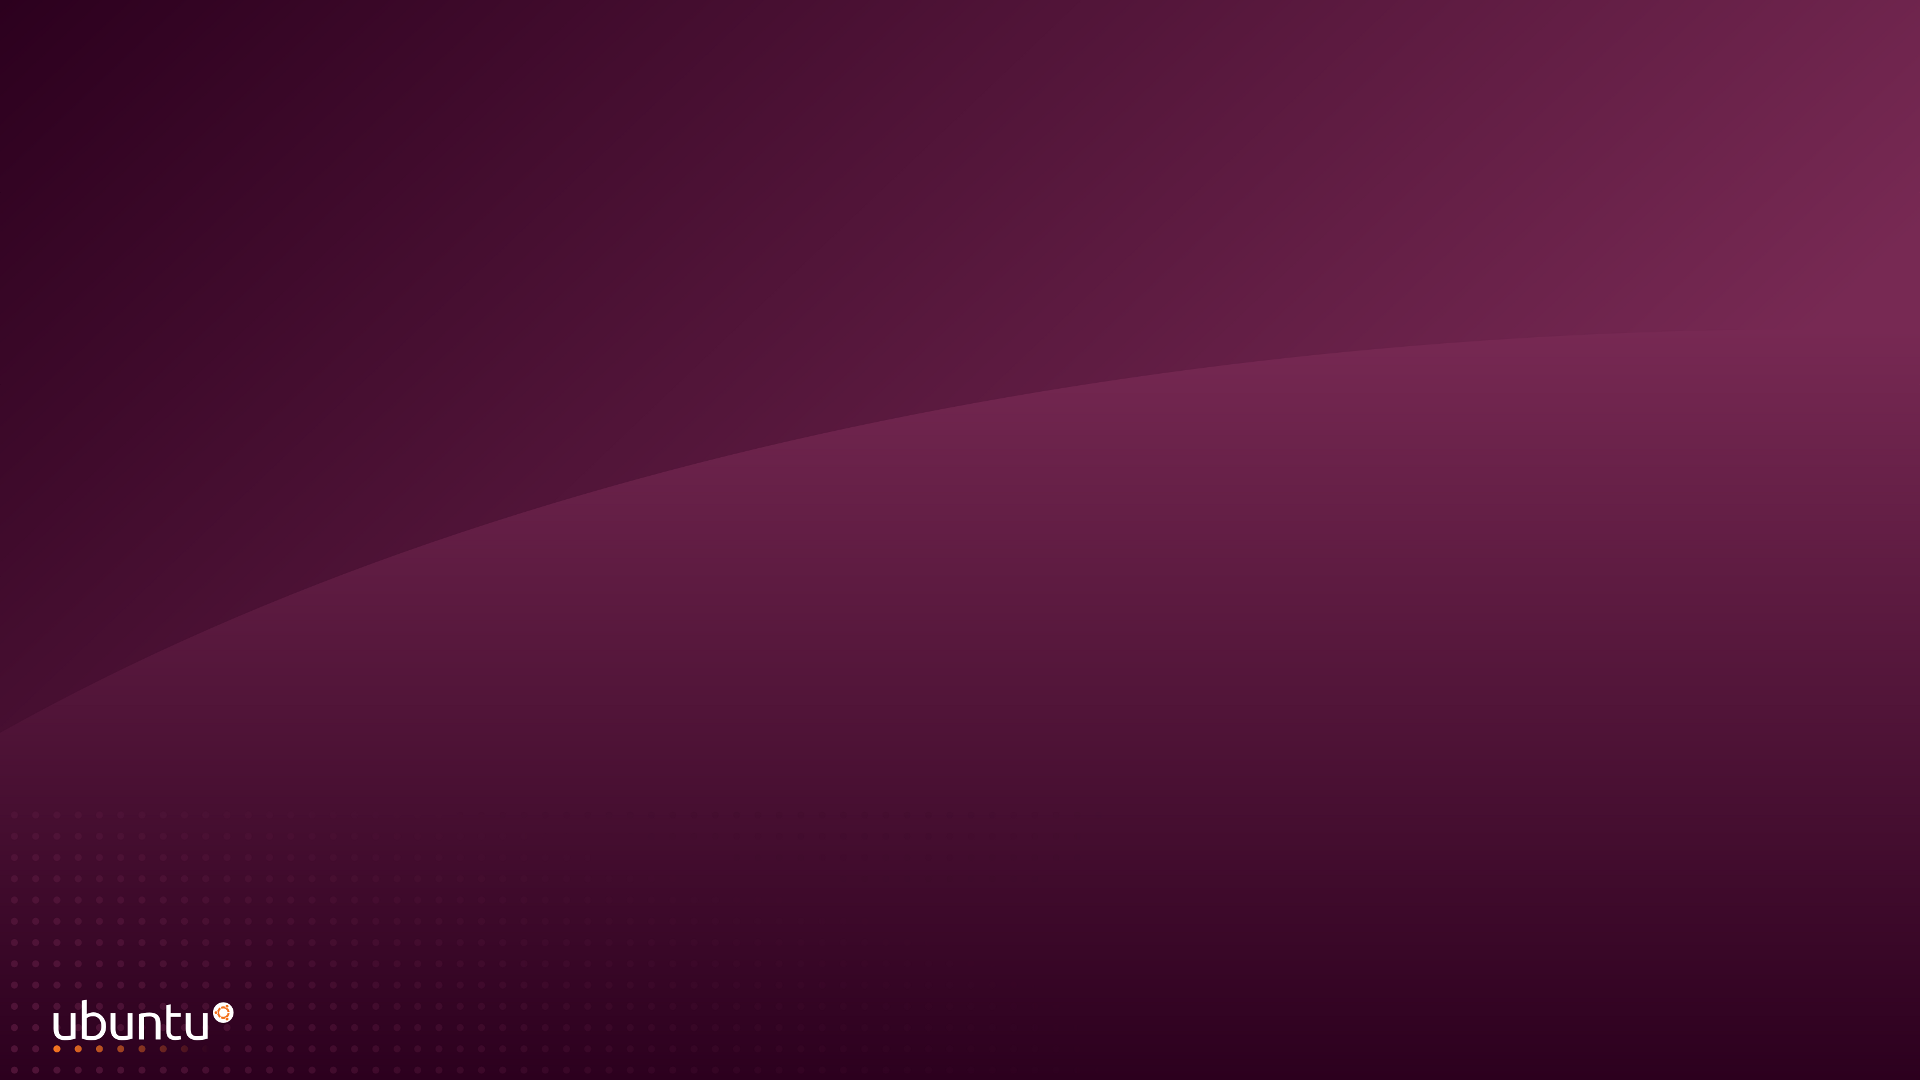 Ubuntu Wallpaper 1920X1080 wallpaper   219871 1920x1080